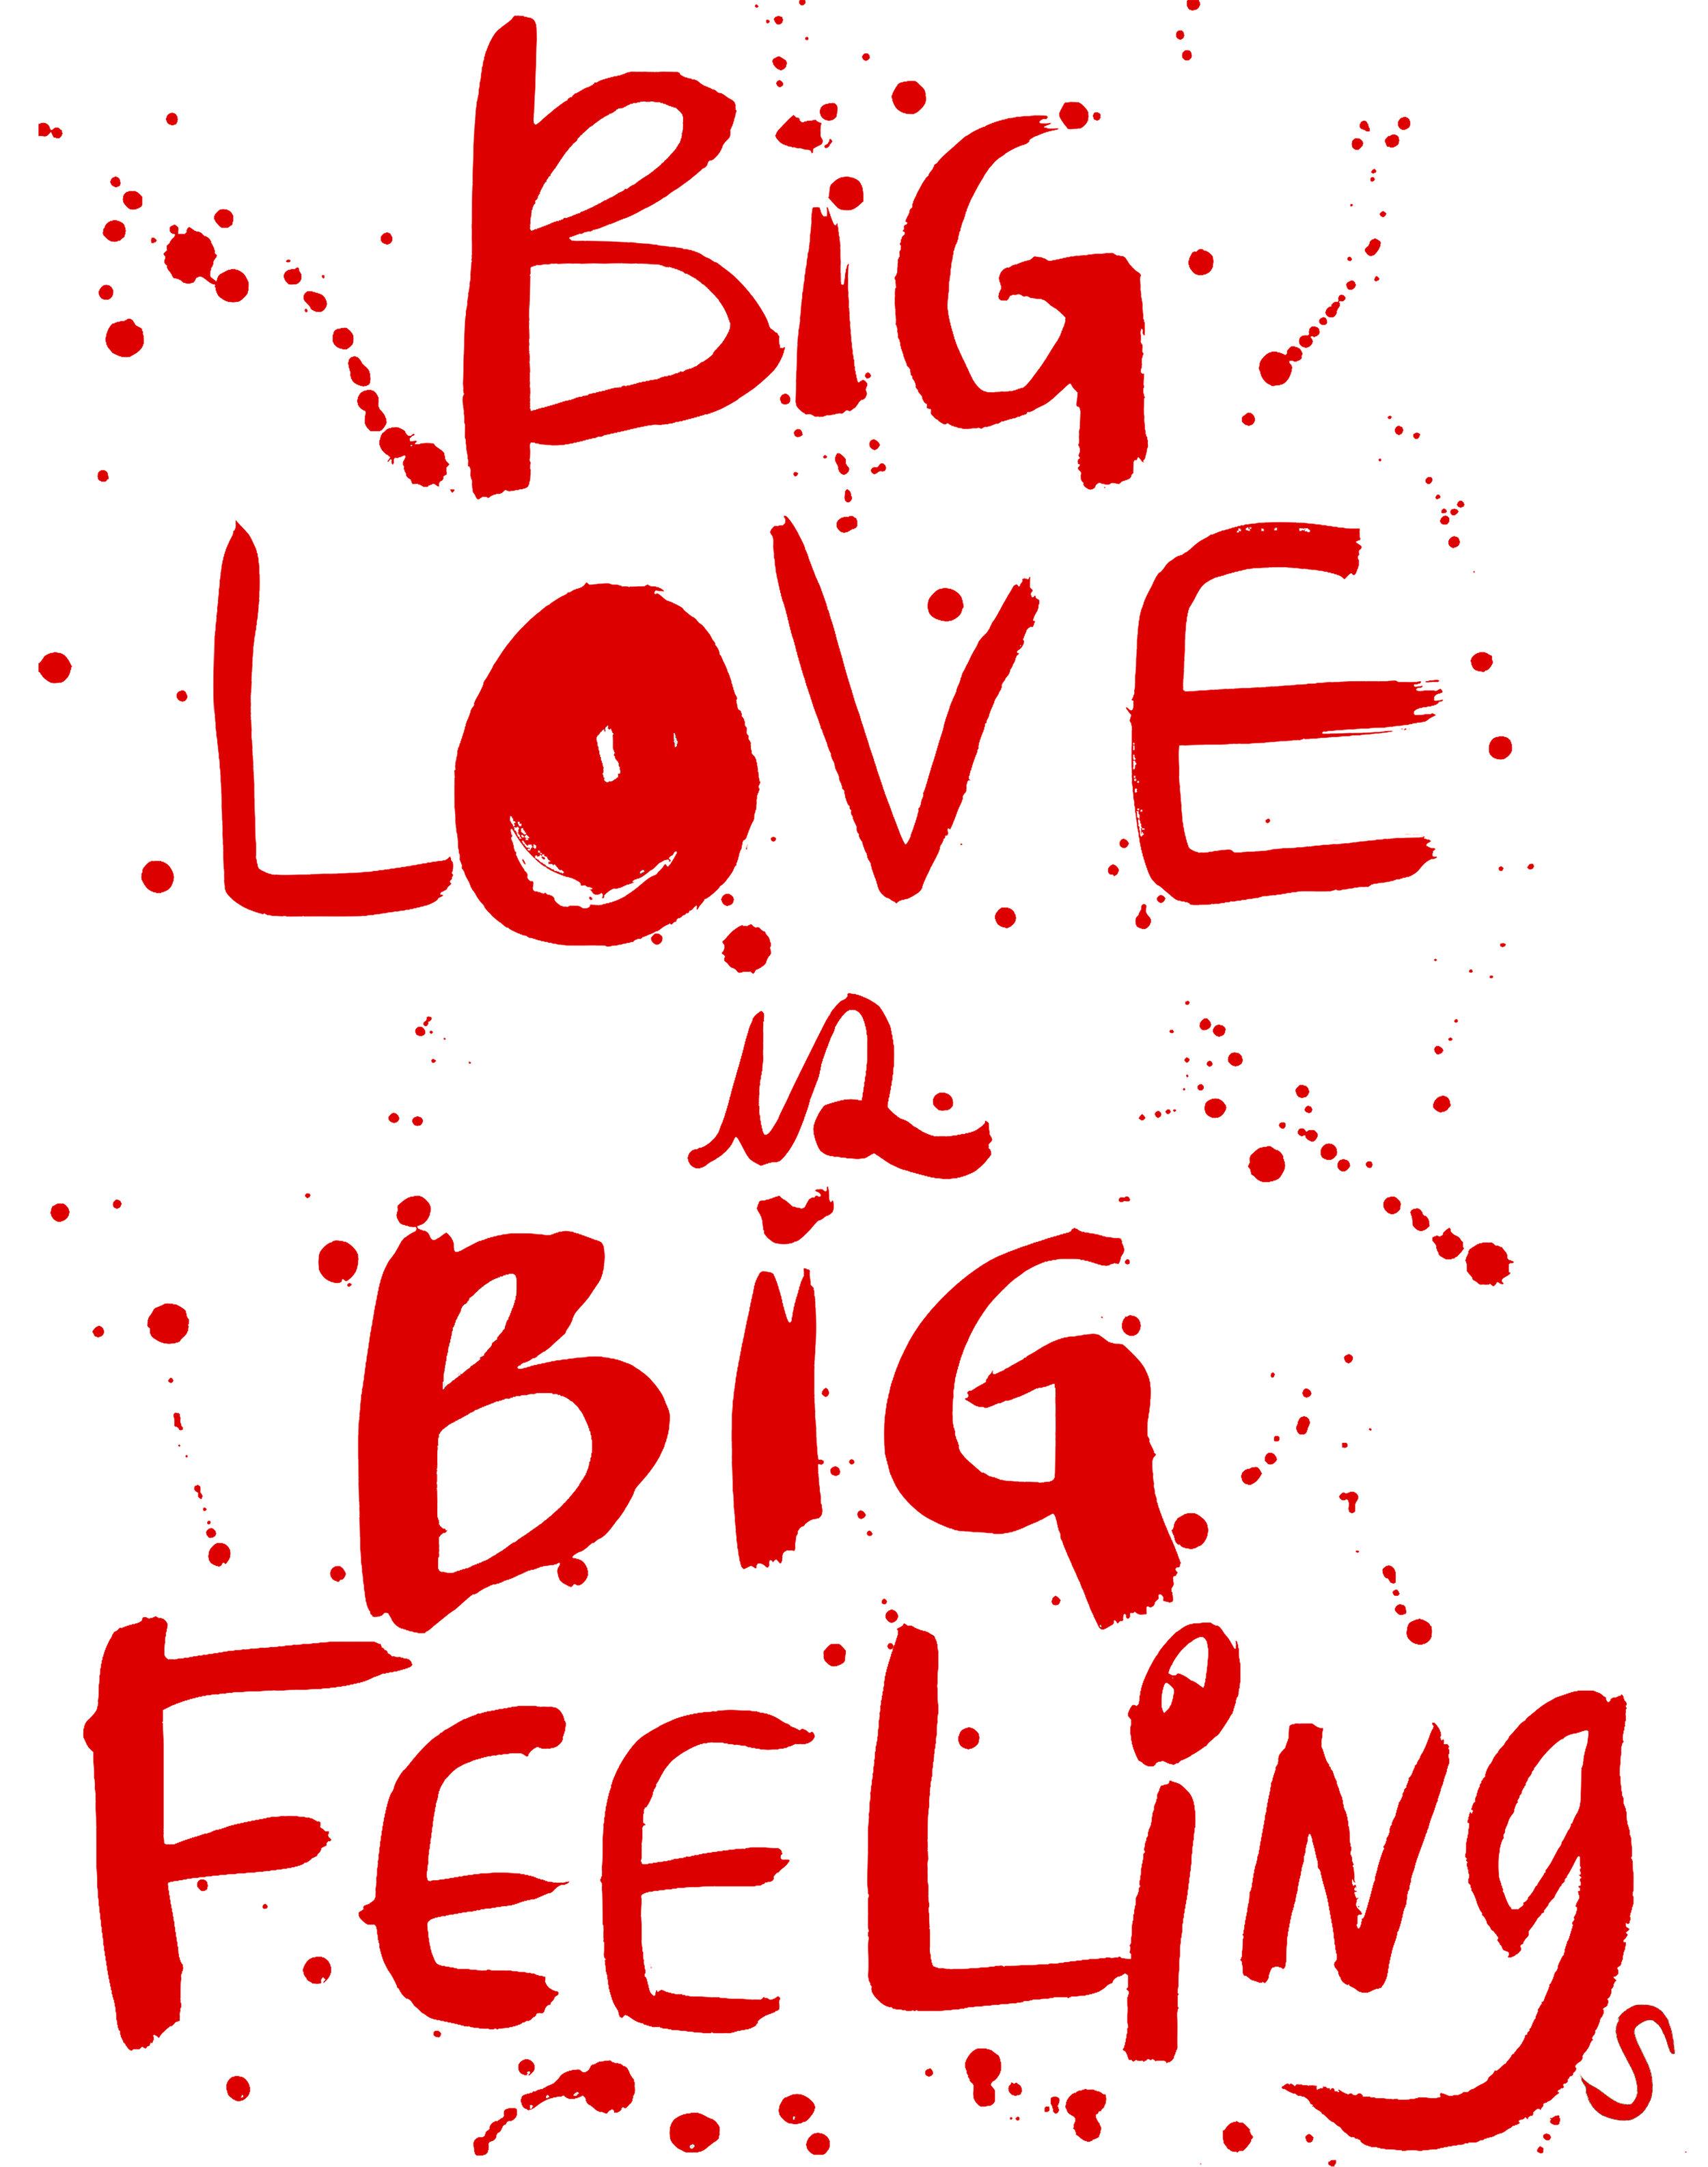 022017_bigloveisbigfeelings_valentines2017_forprinter.jpg